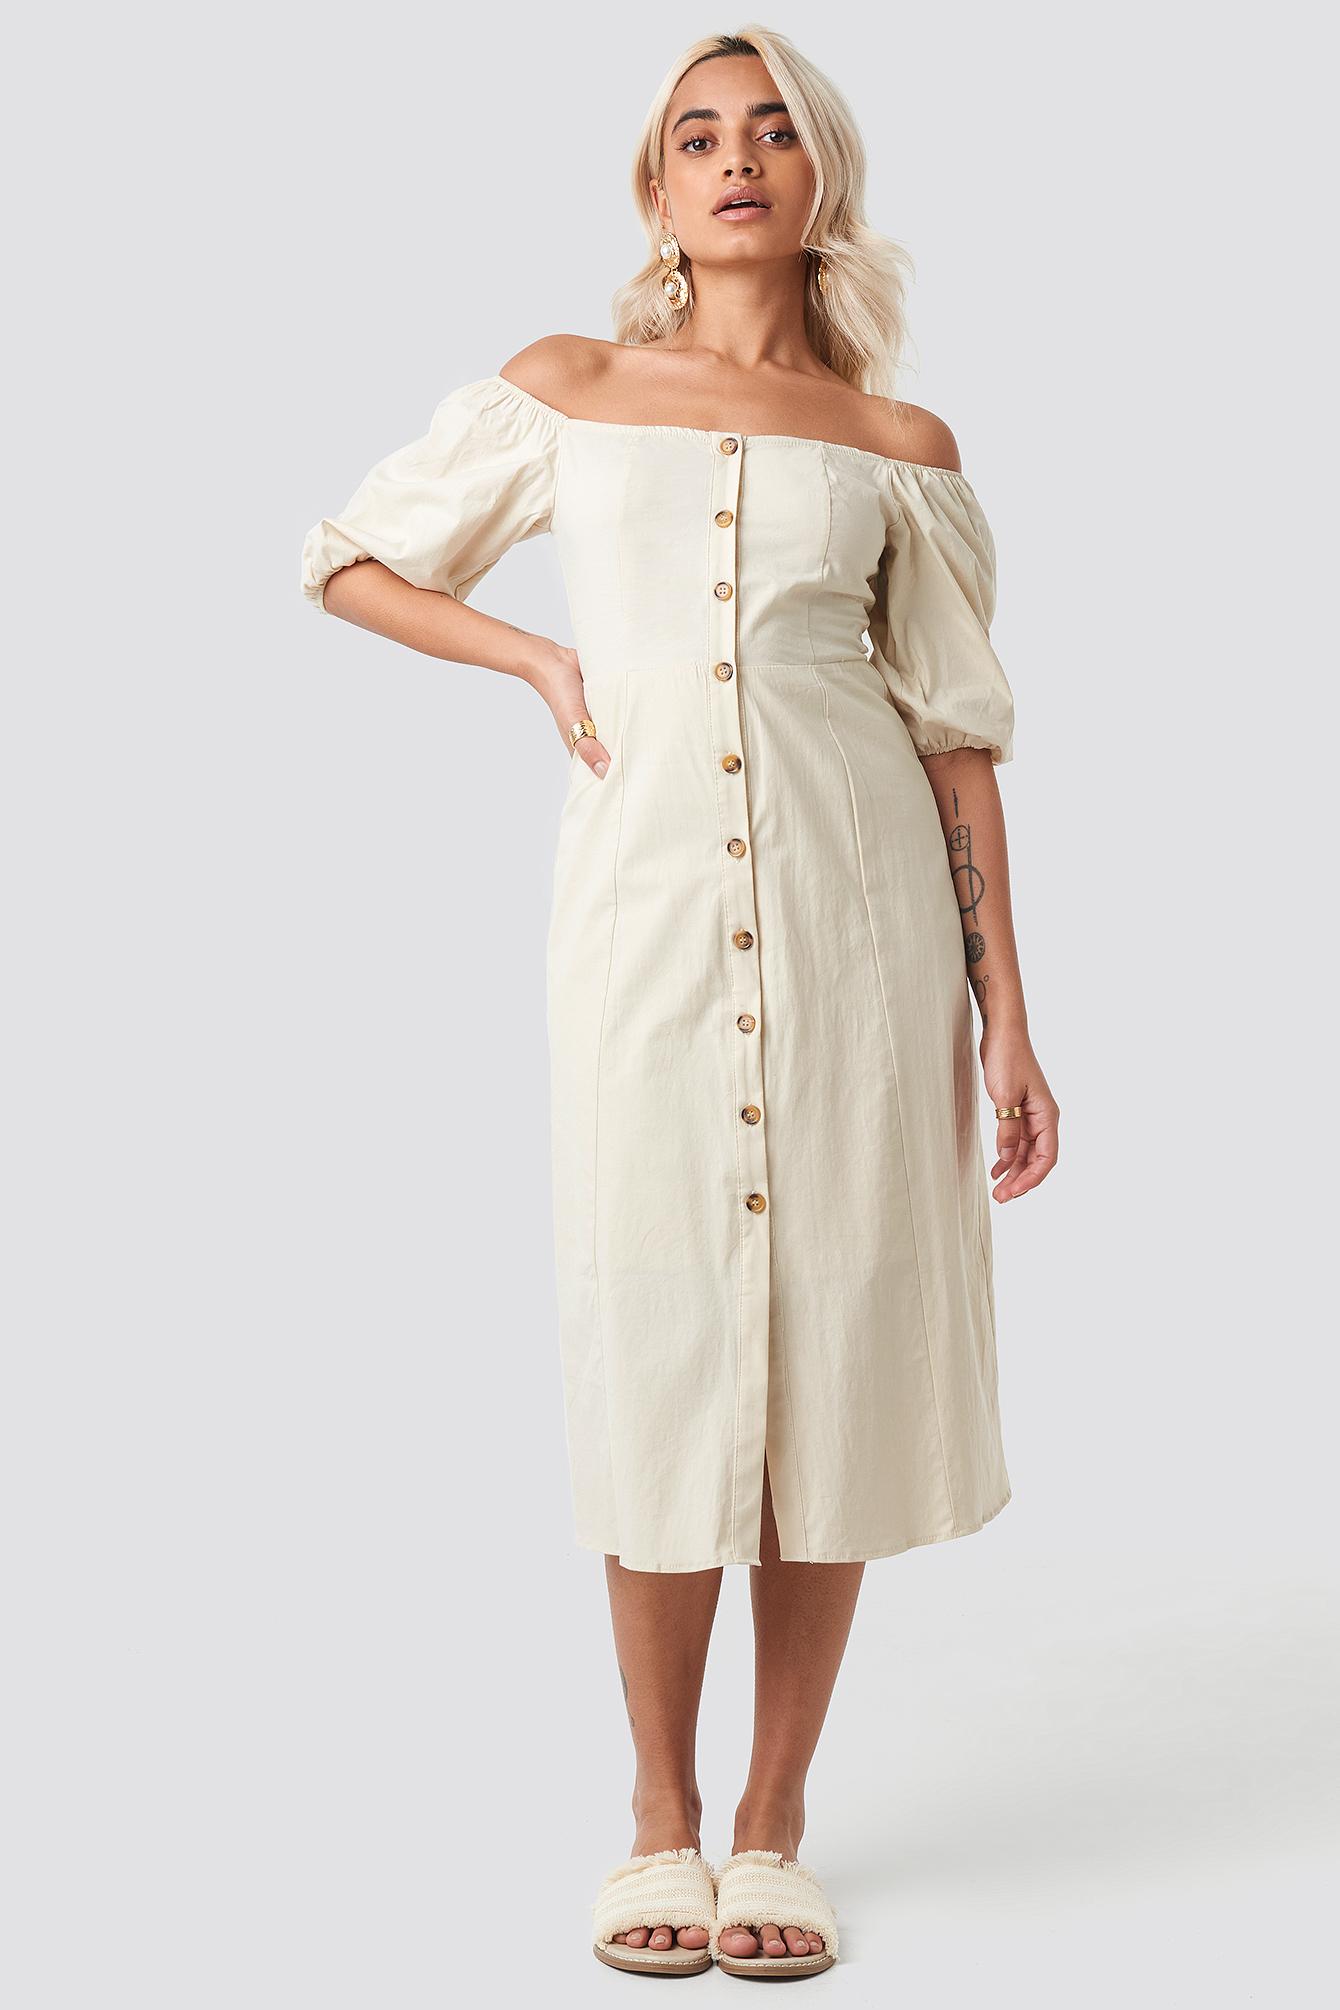 trendyol -  Off Shoulder Button Detail Midi Dress - Beige